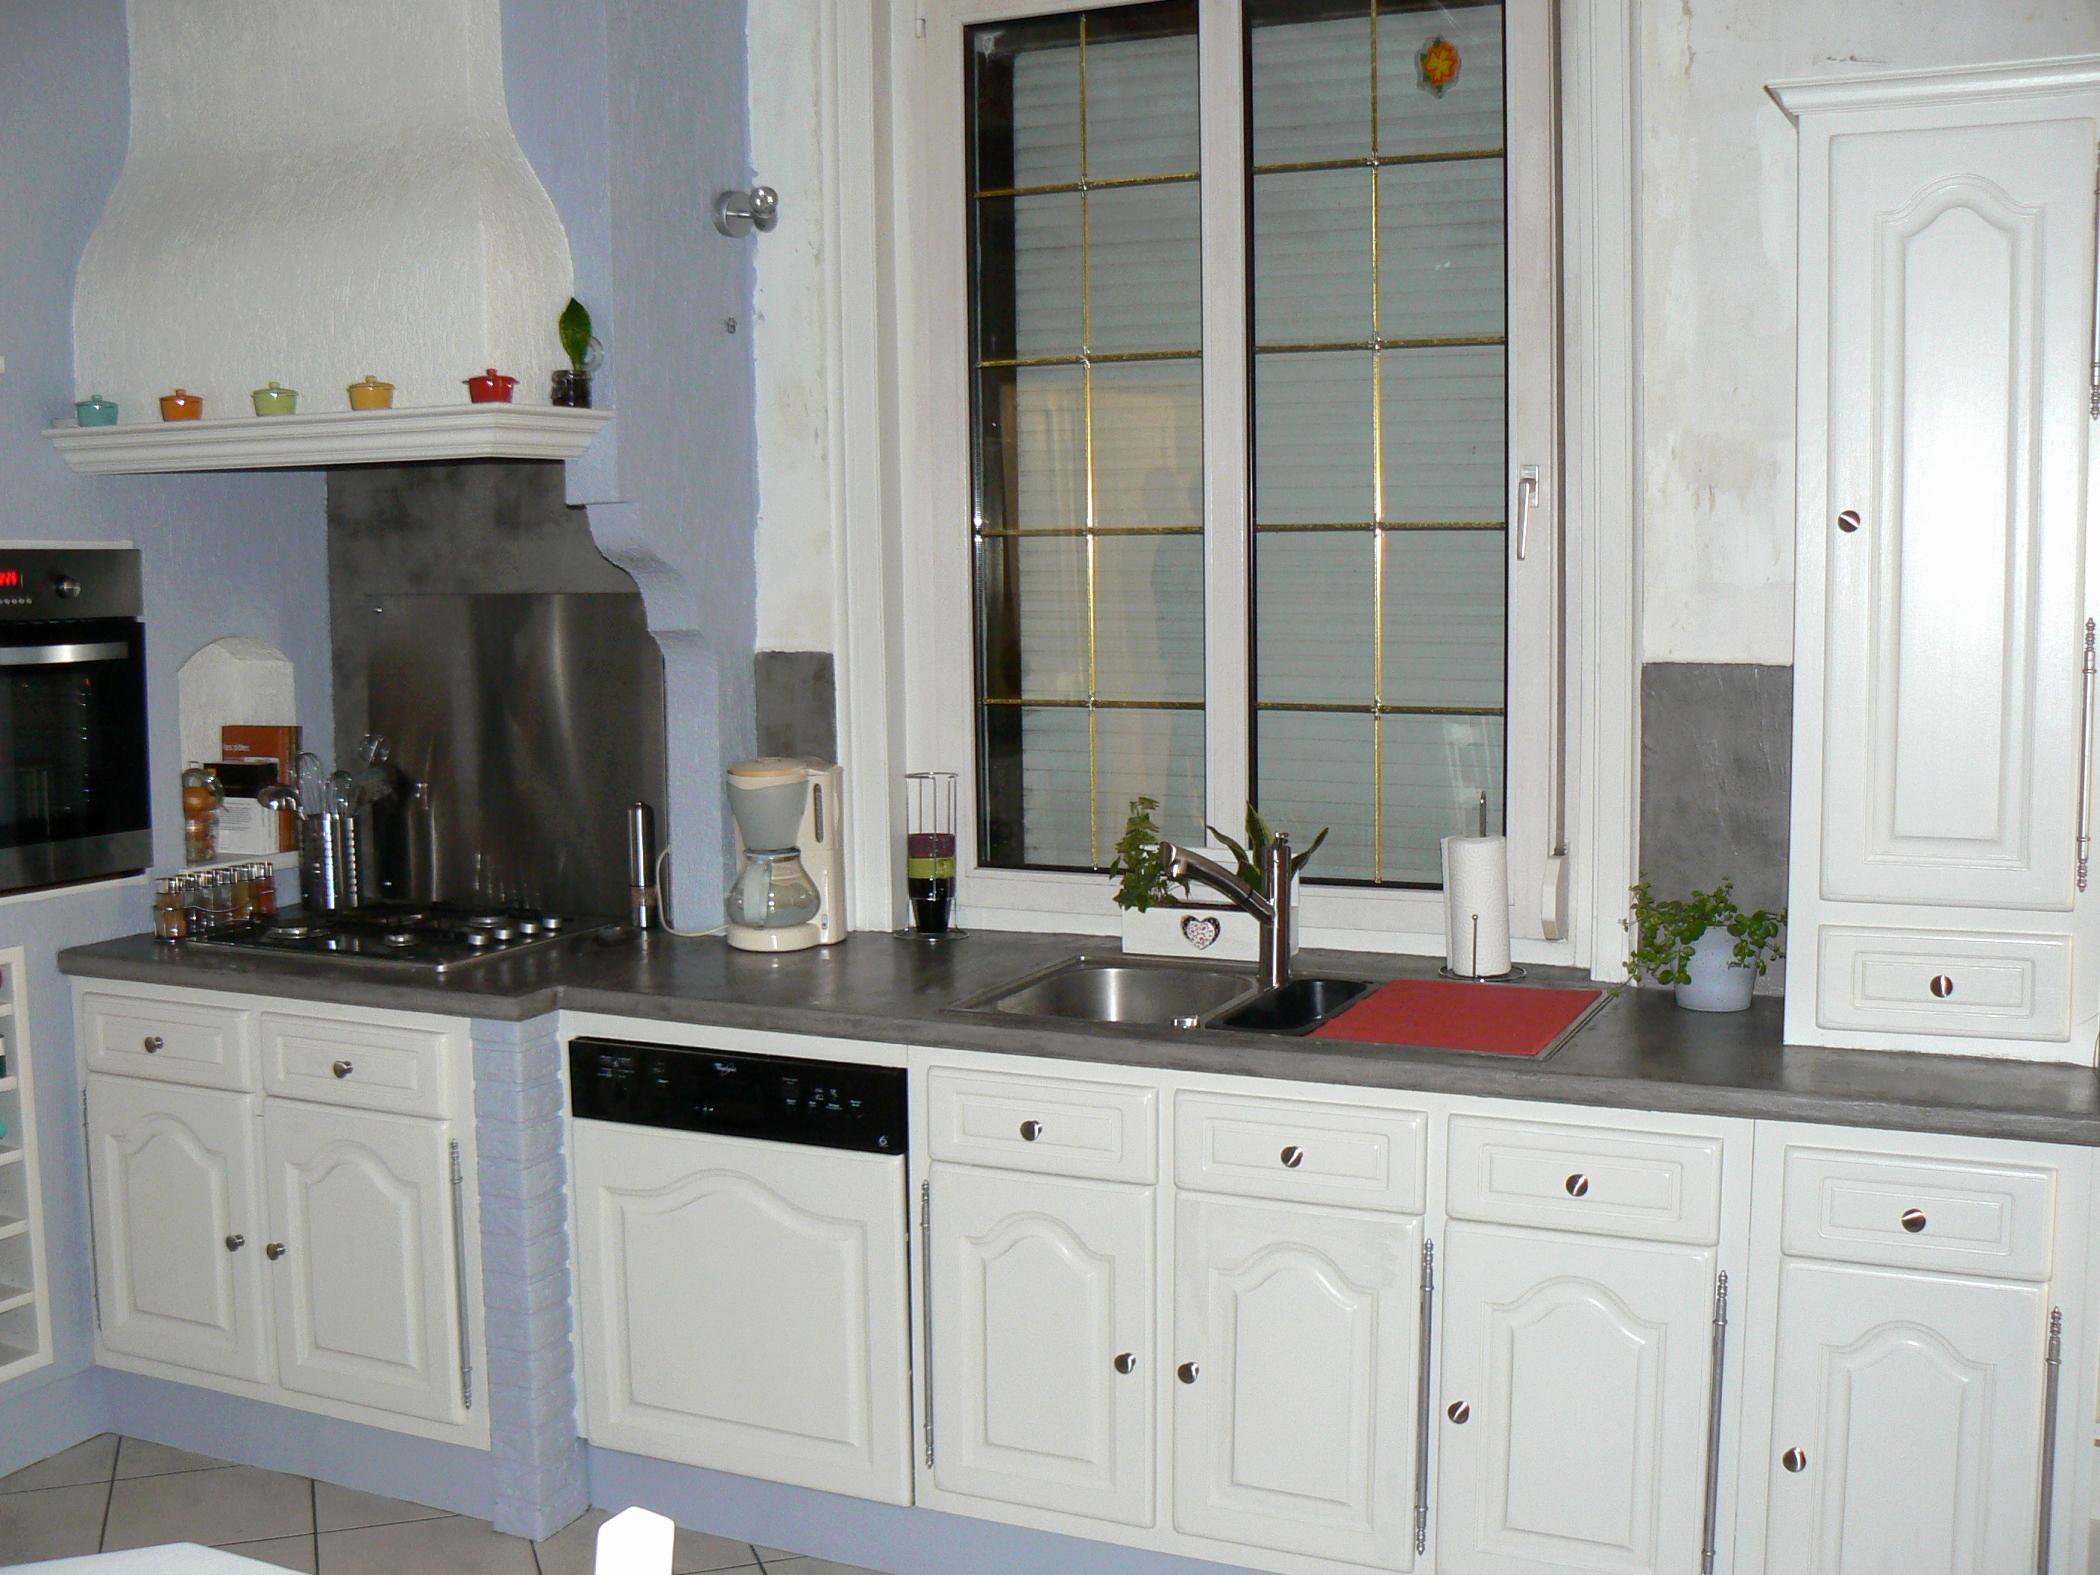 Moderniser Cuisine Rustique Élégant Galerie Moderniser Cuisine Rustique Frais 25 Inspirational S Relooker